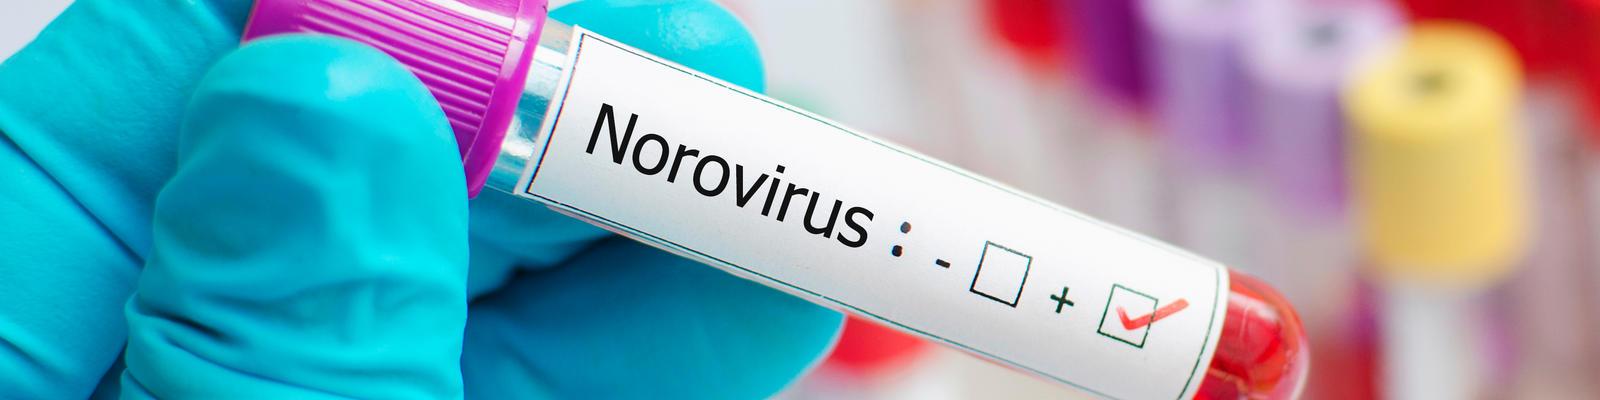 Demystifying the Myths of Norovirus (Photo: Jarun Ontakrai/Shutterstock)